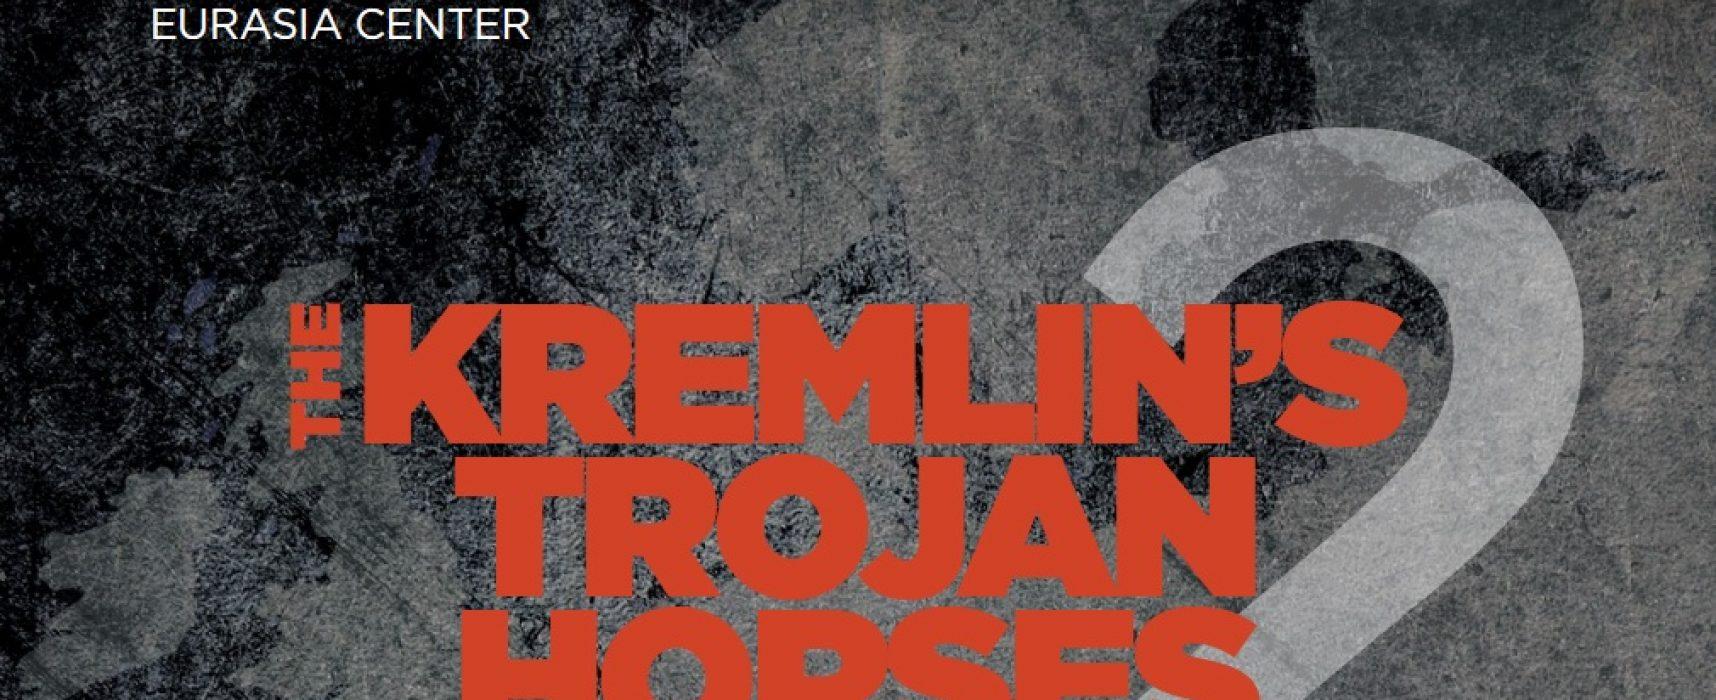 The Kremlin's Trojan Horses 2.0